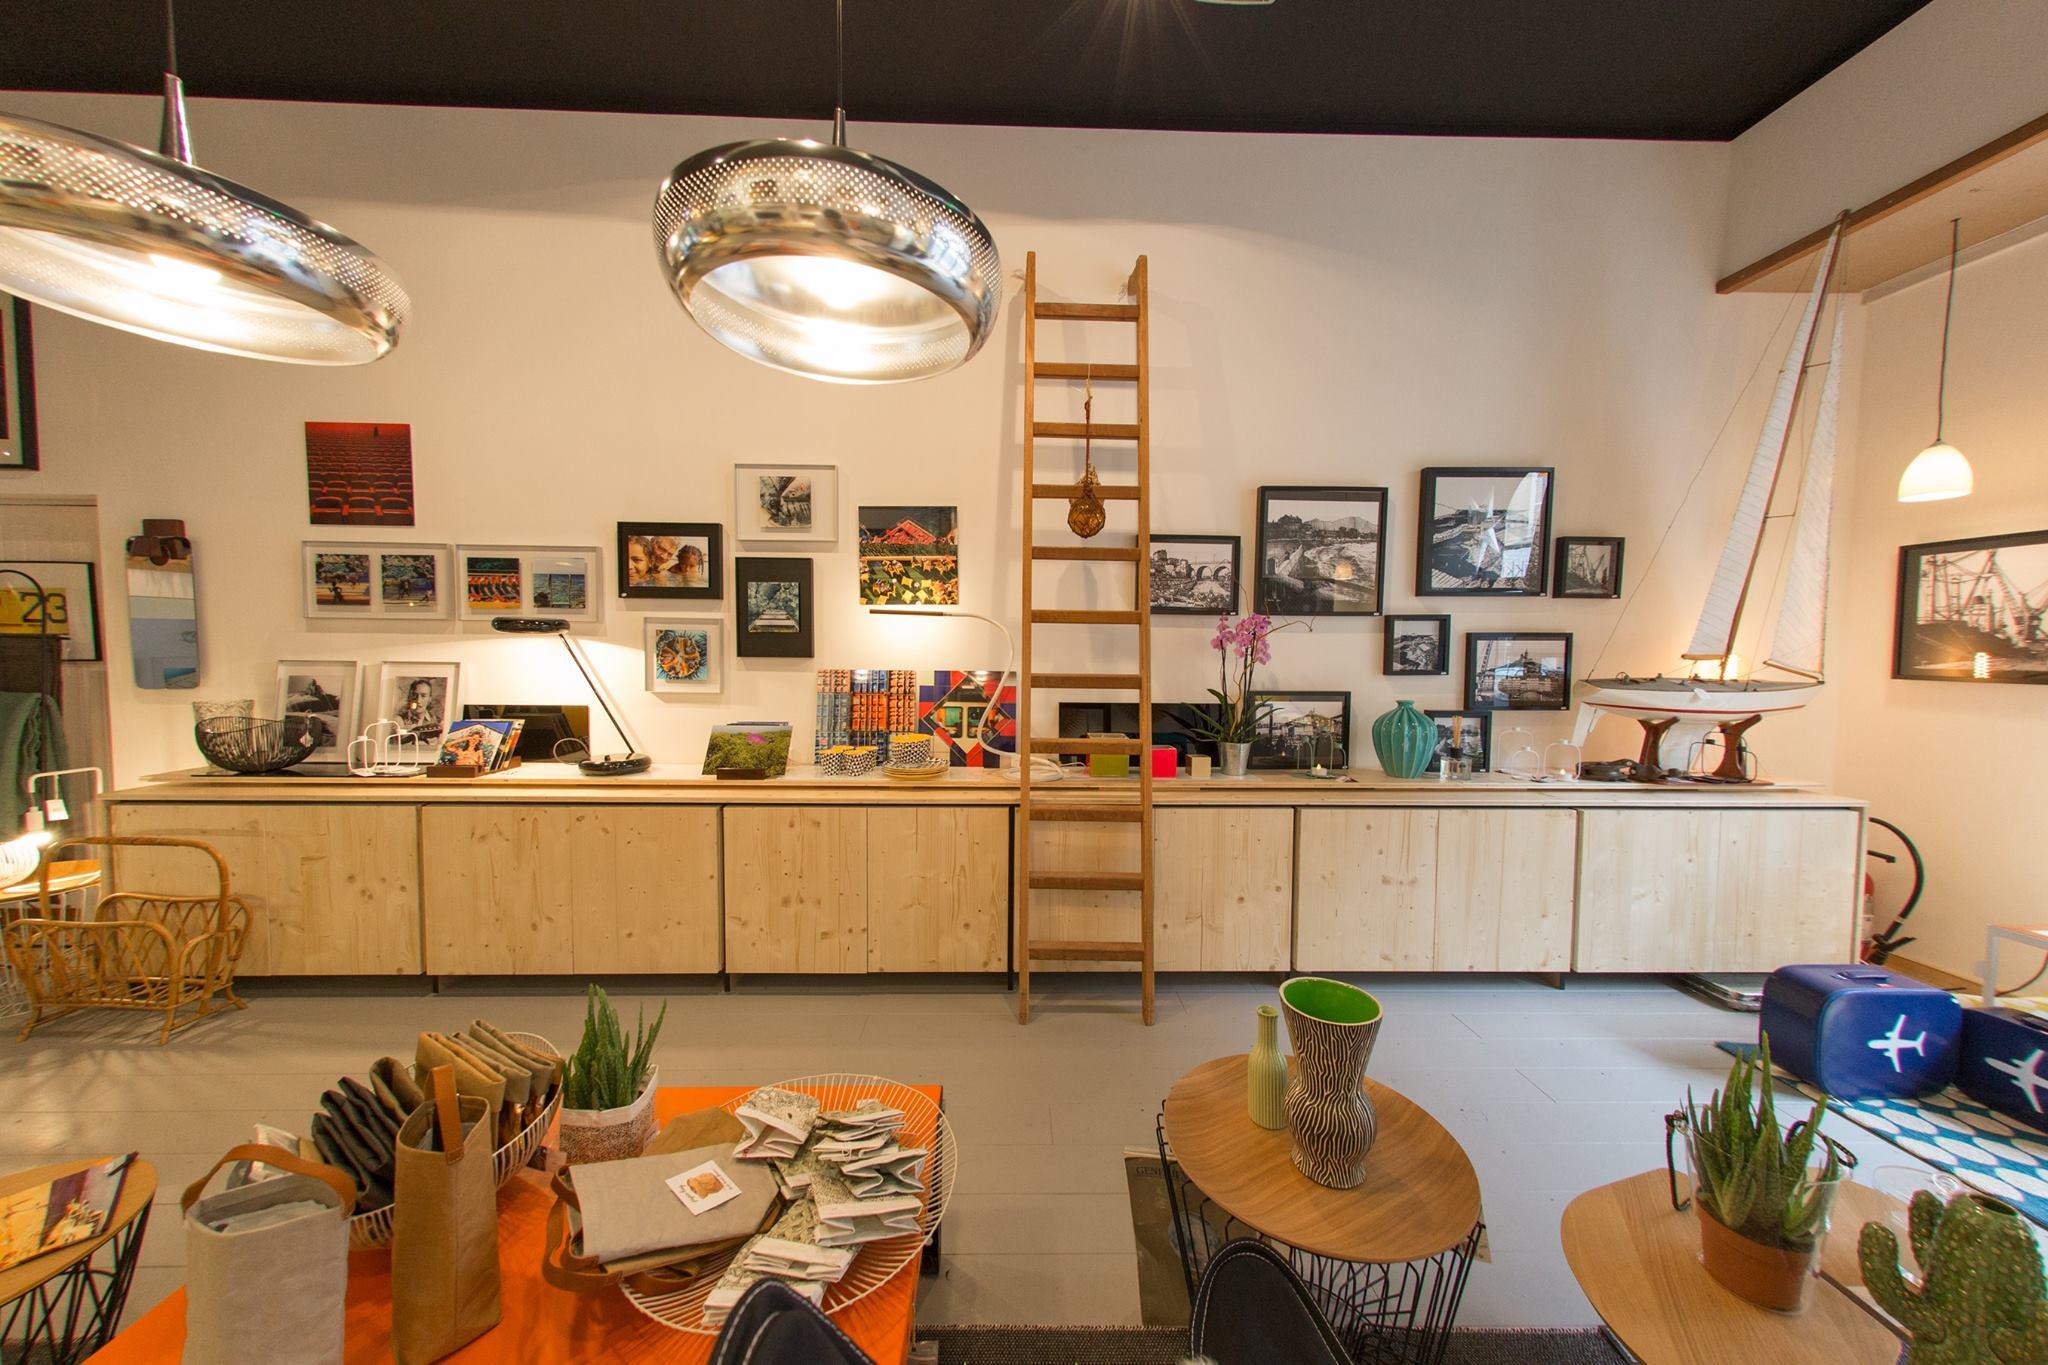 d coration marseille unity rive gauche love spots. Black Bedroom Furniture Sets. Home Design Ideas